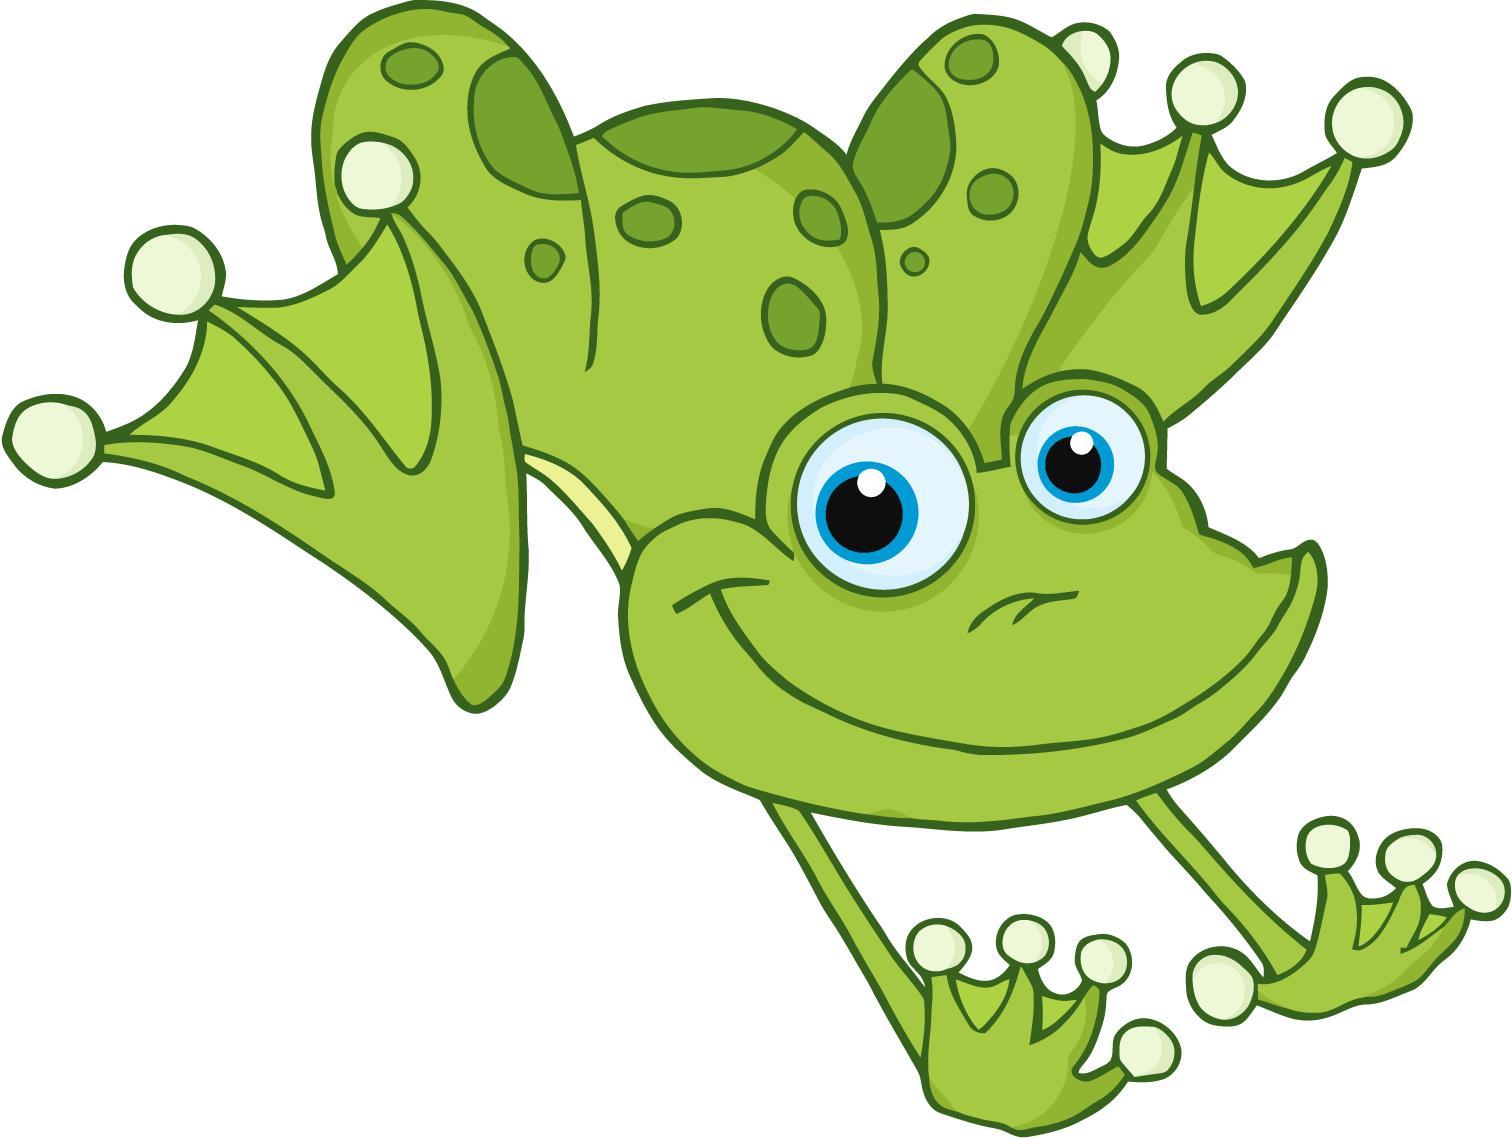 Jumping frog animation - photo#6